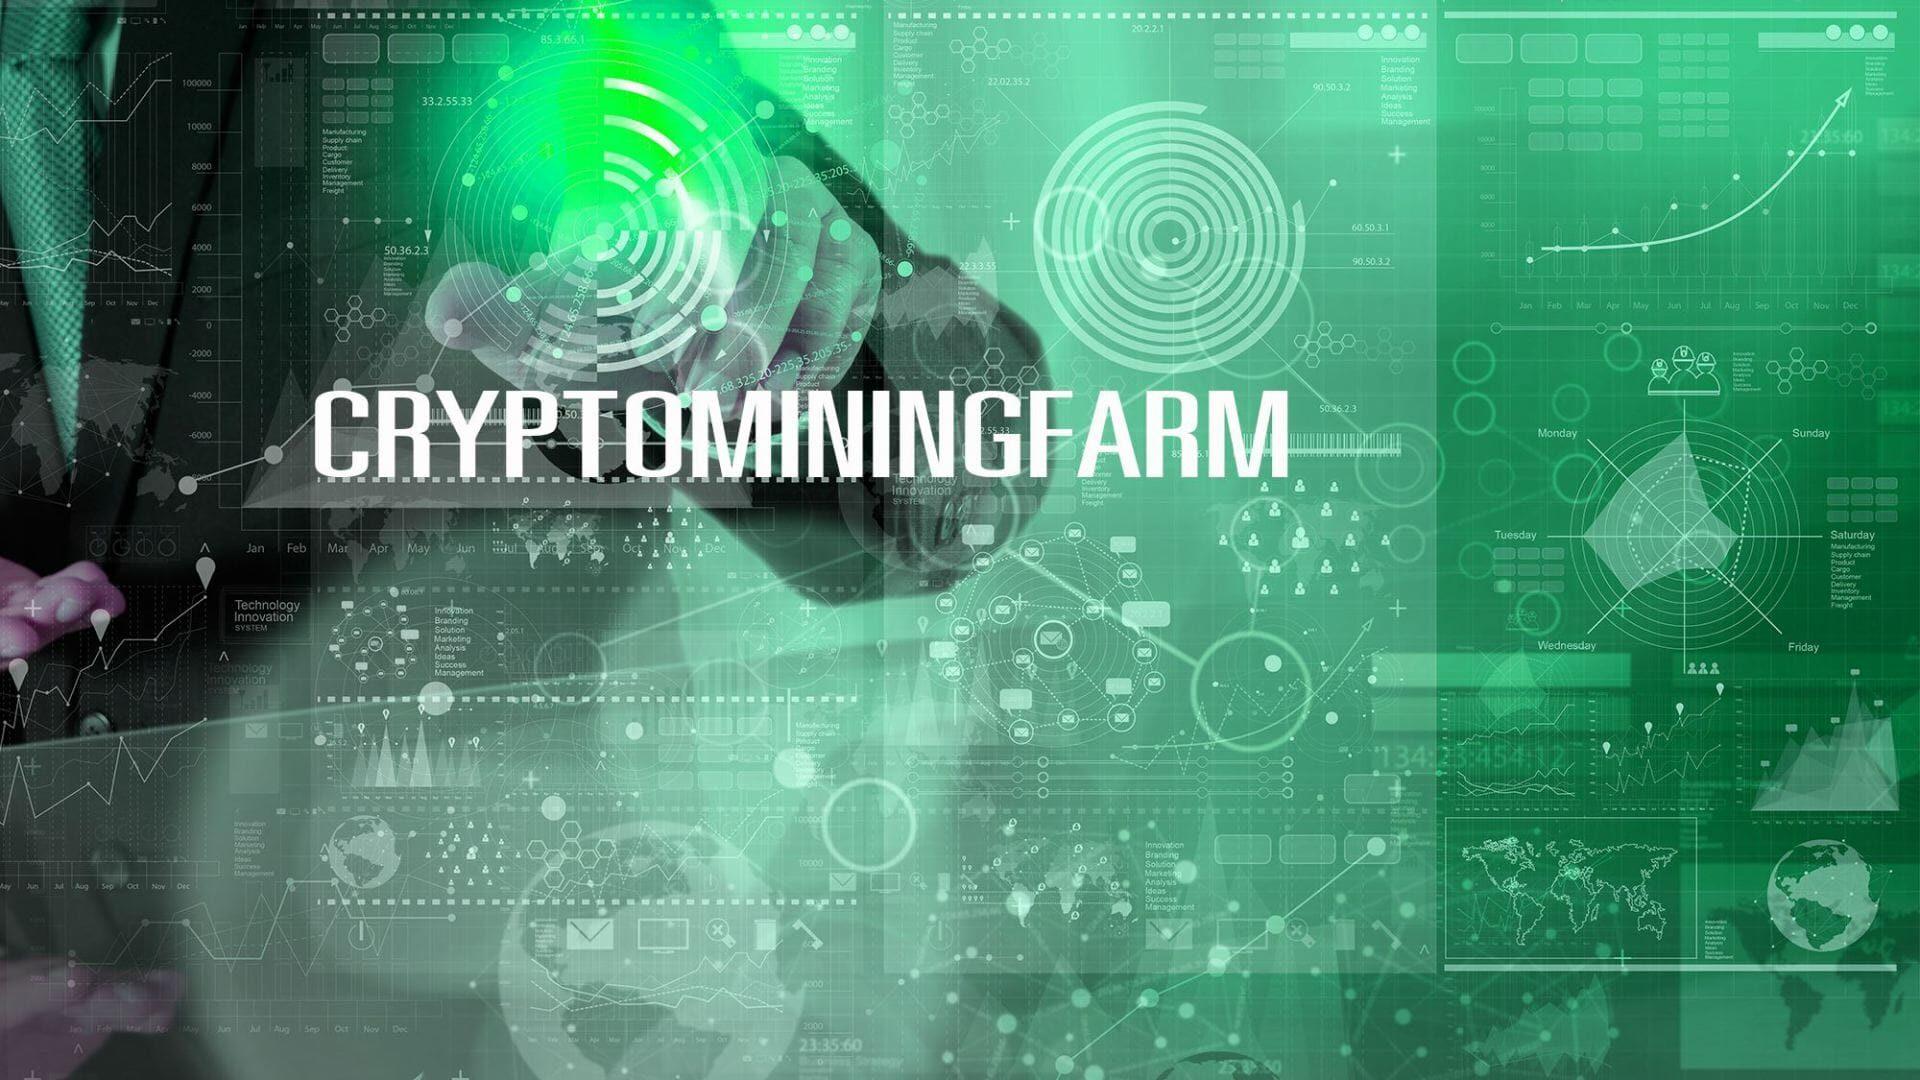 ¿Es Cryptominingfarm una estafa?